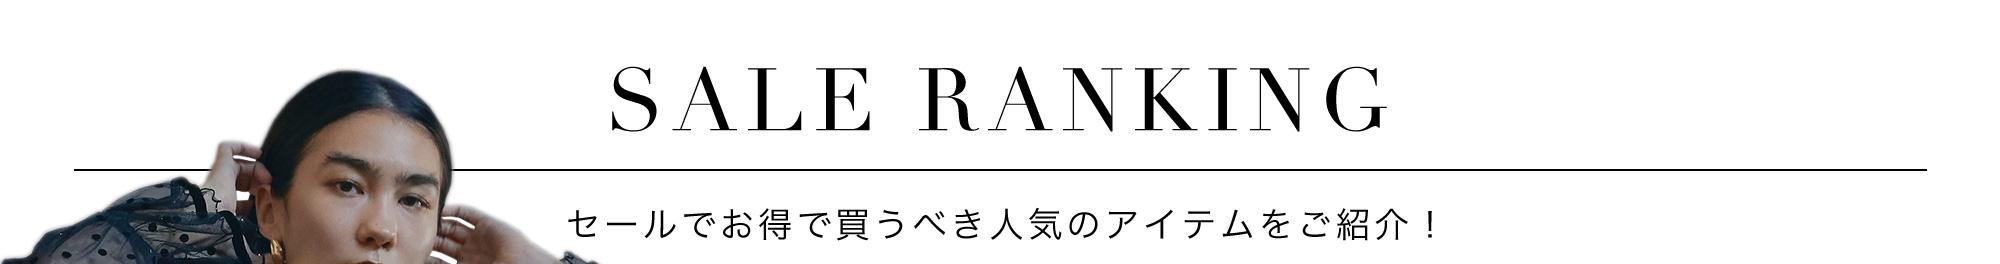 SALE RANKING